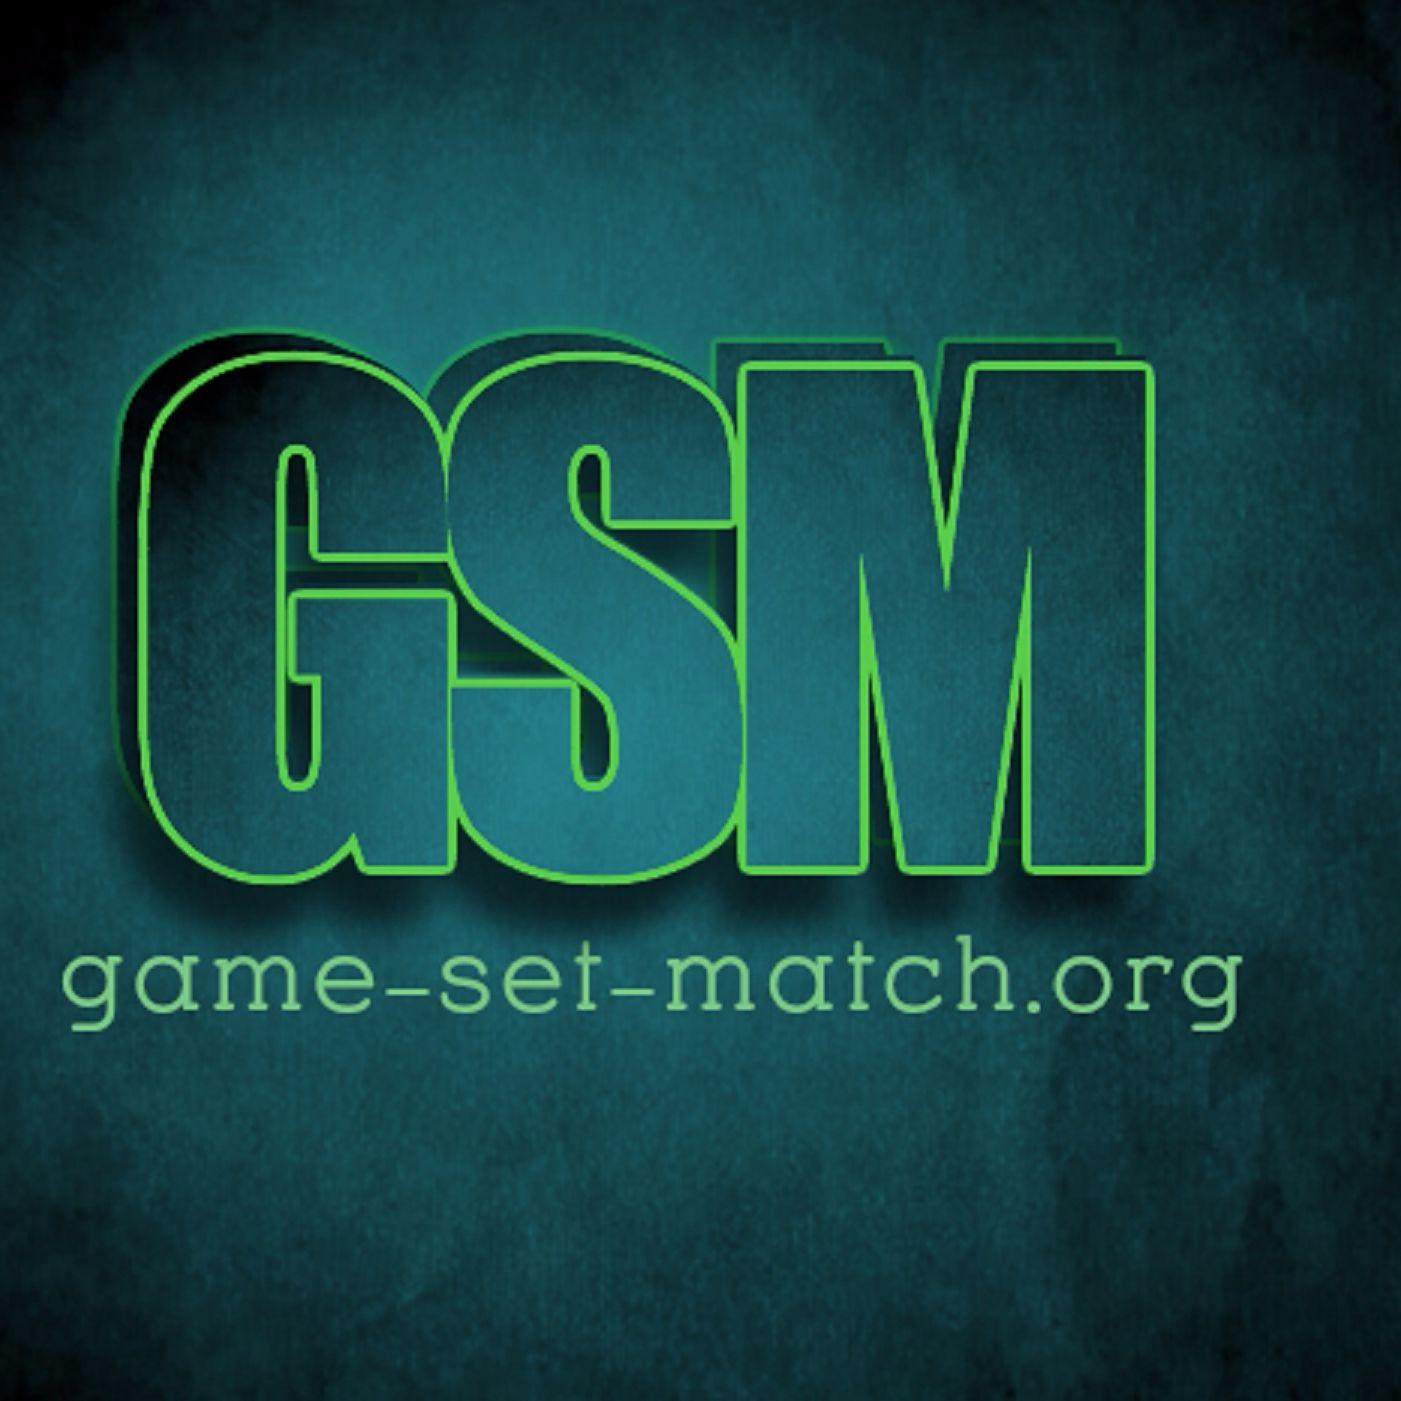 GameSetMatch